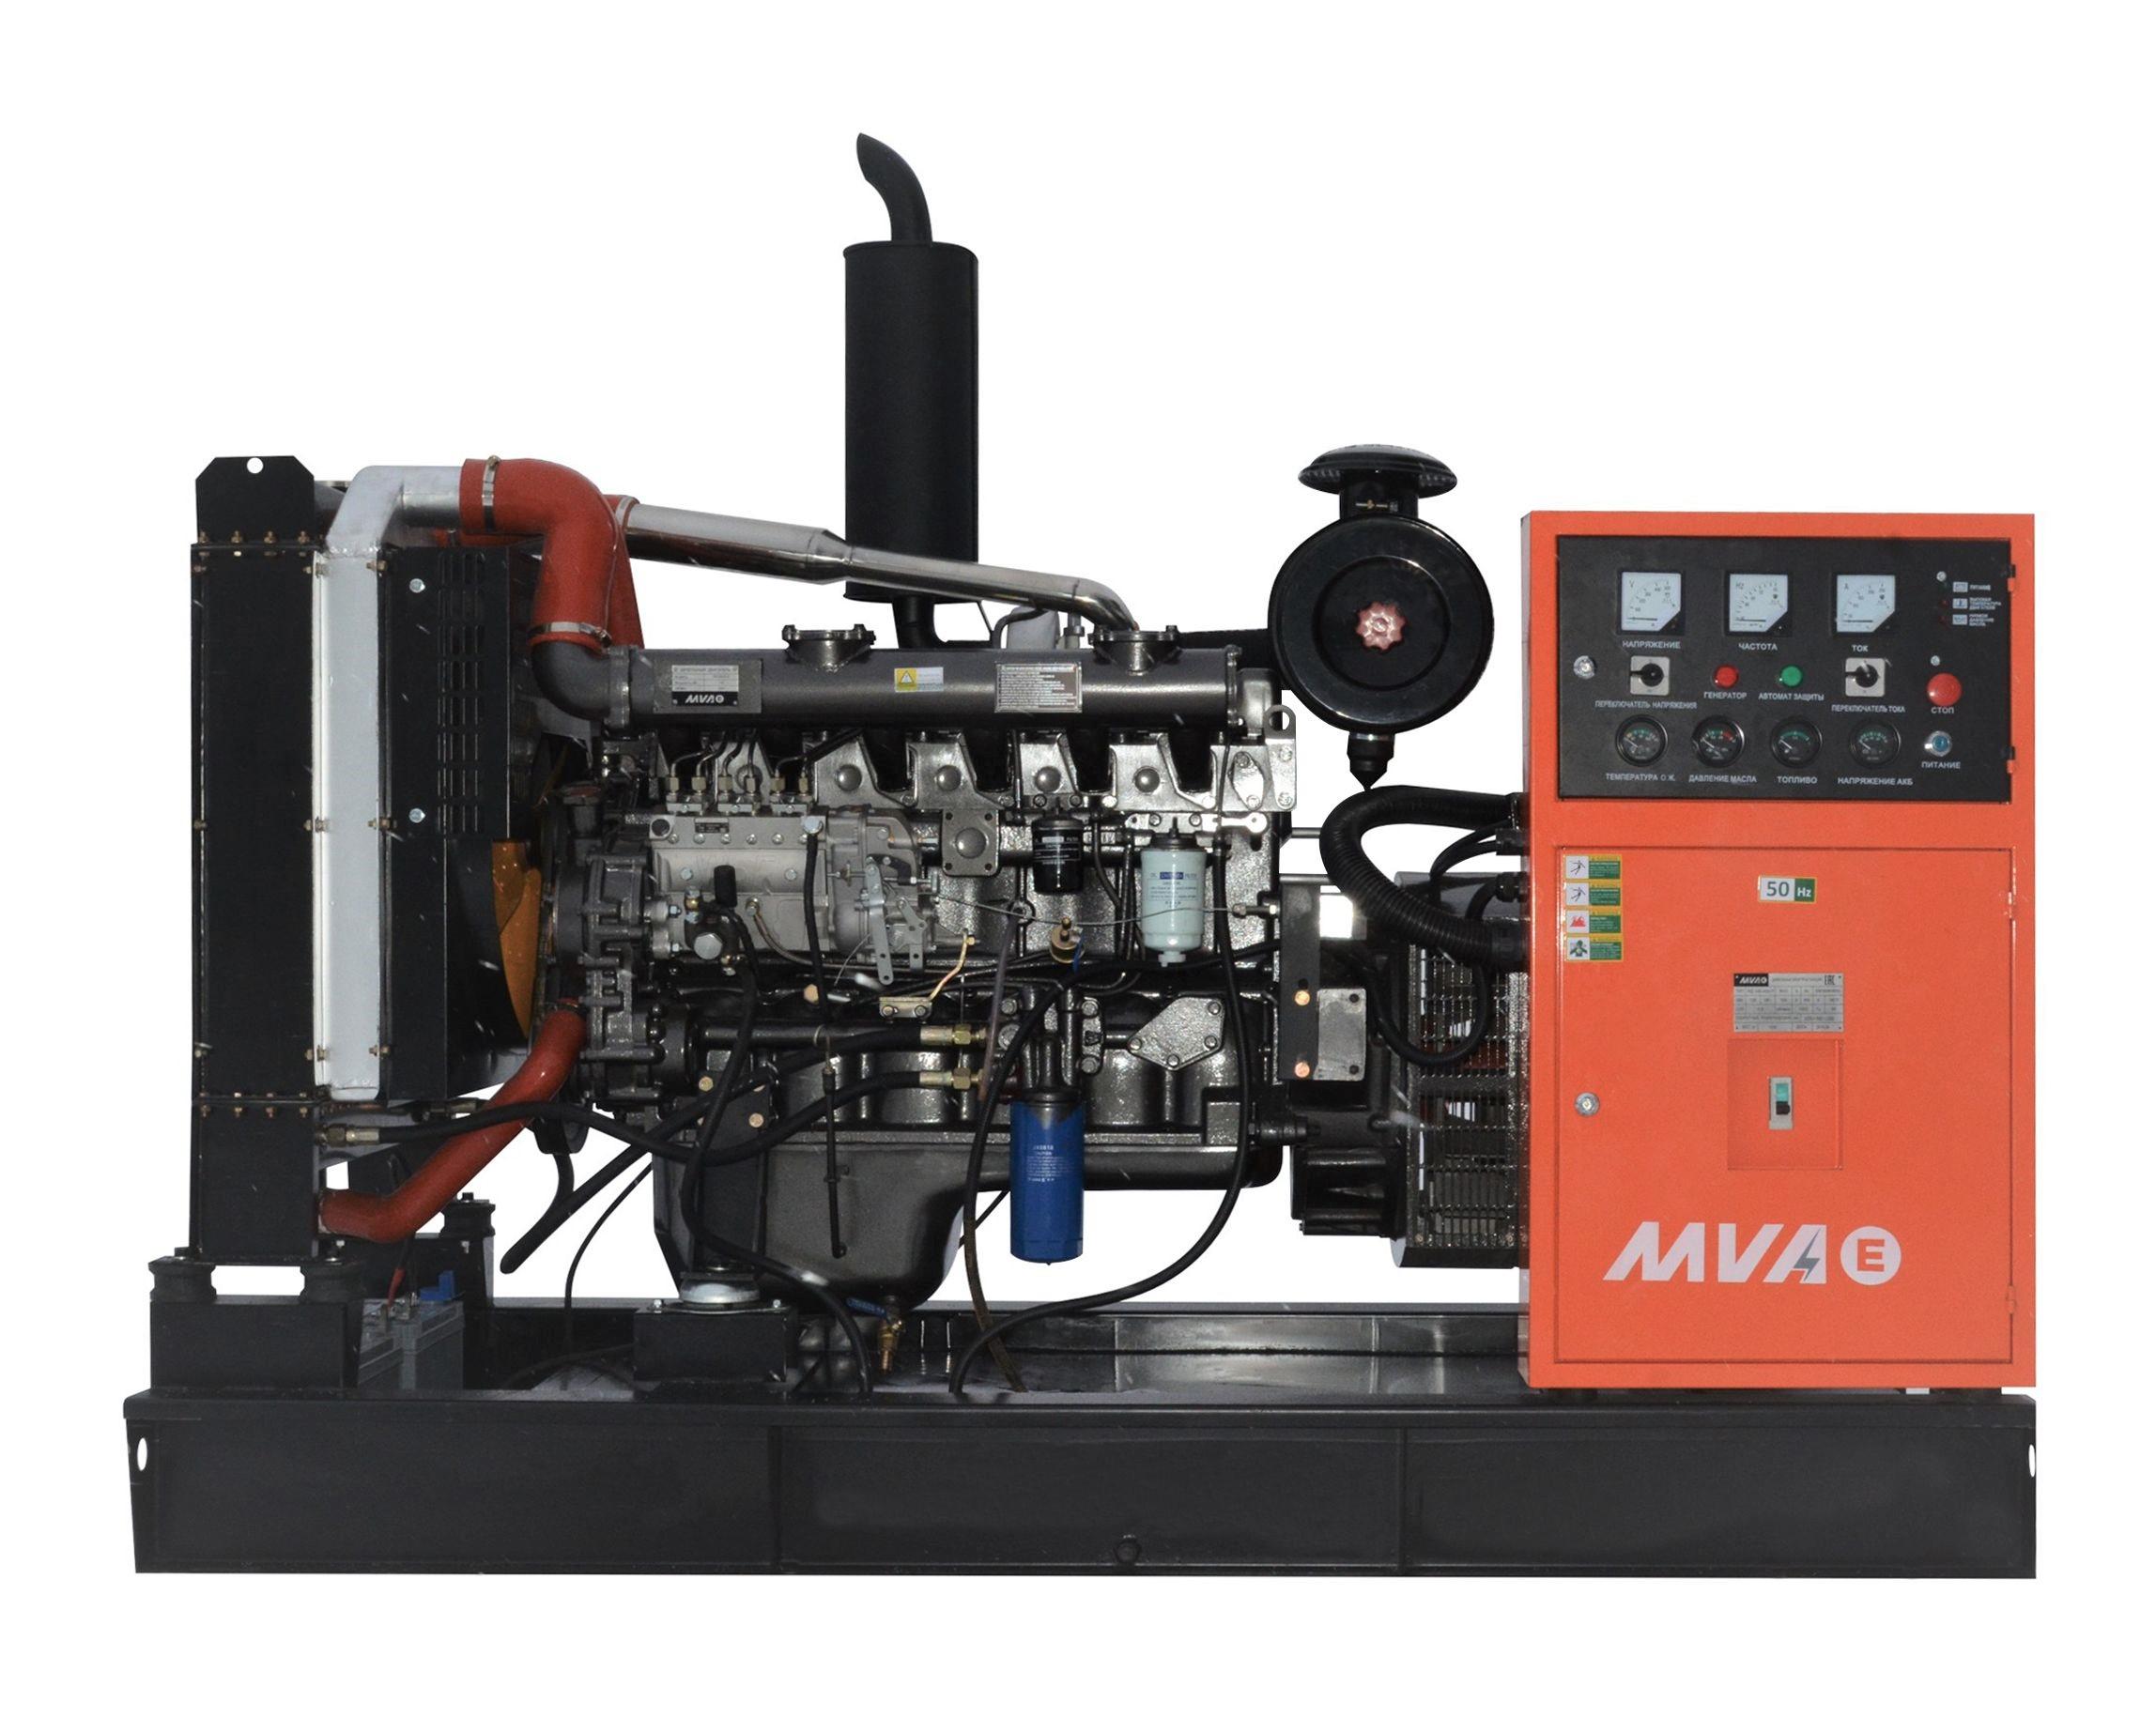 Внешний вид MVAE АД-100-400-АР на раме c АВР